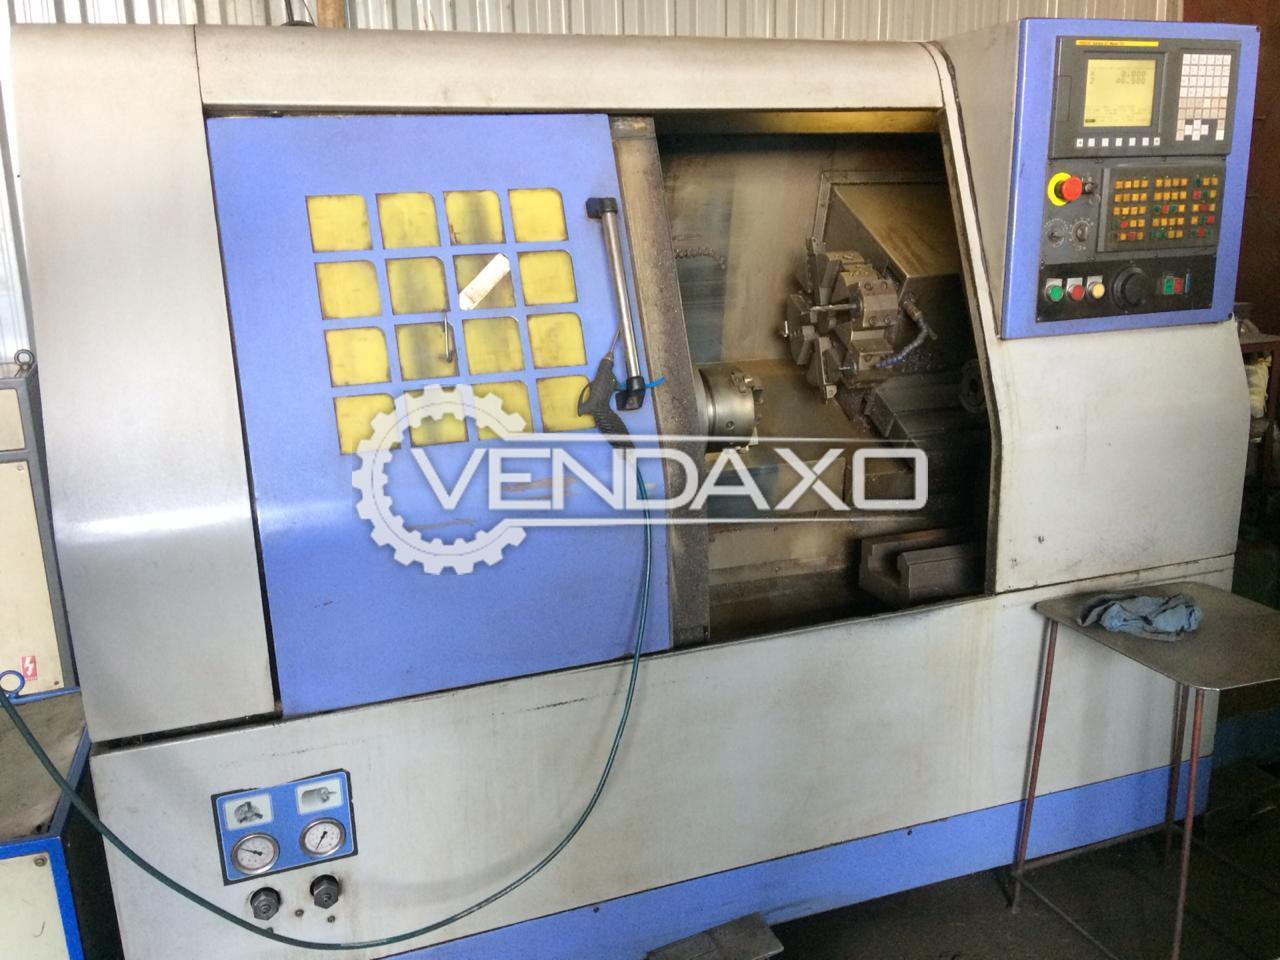 MACPOWER VX-165 CNC Turning Center - Admit Between Center - 300 mm